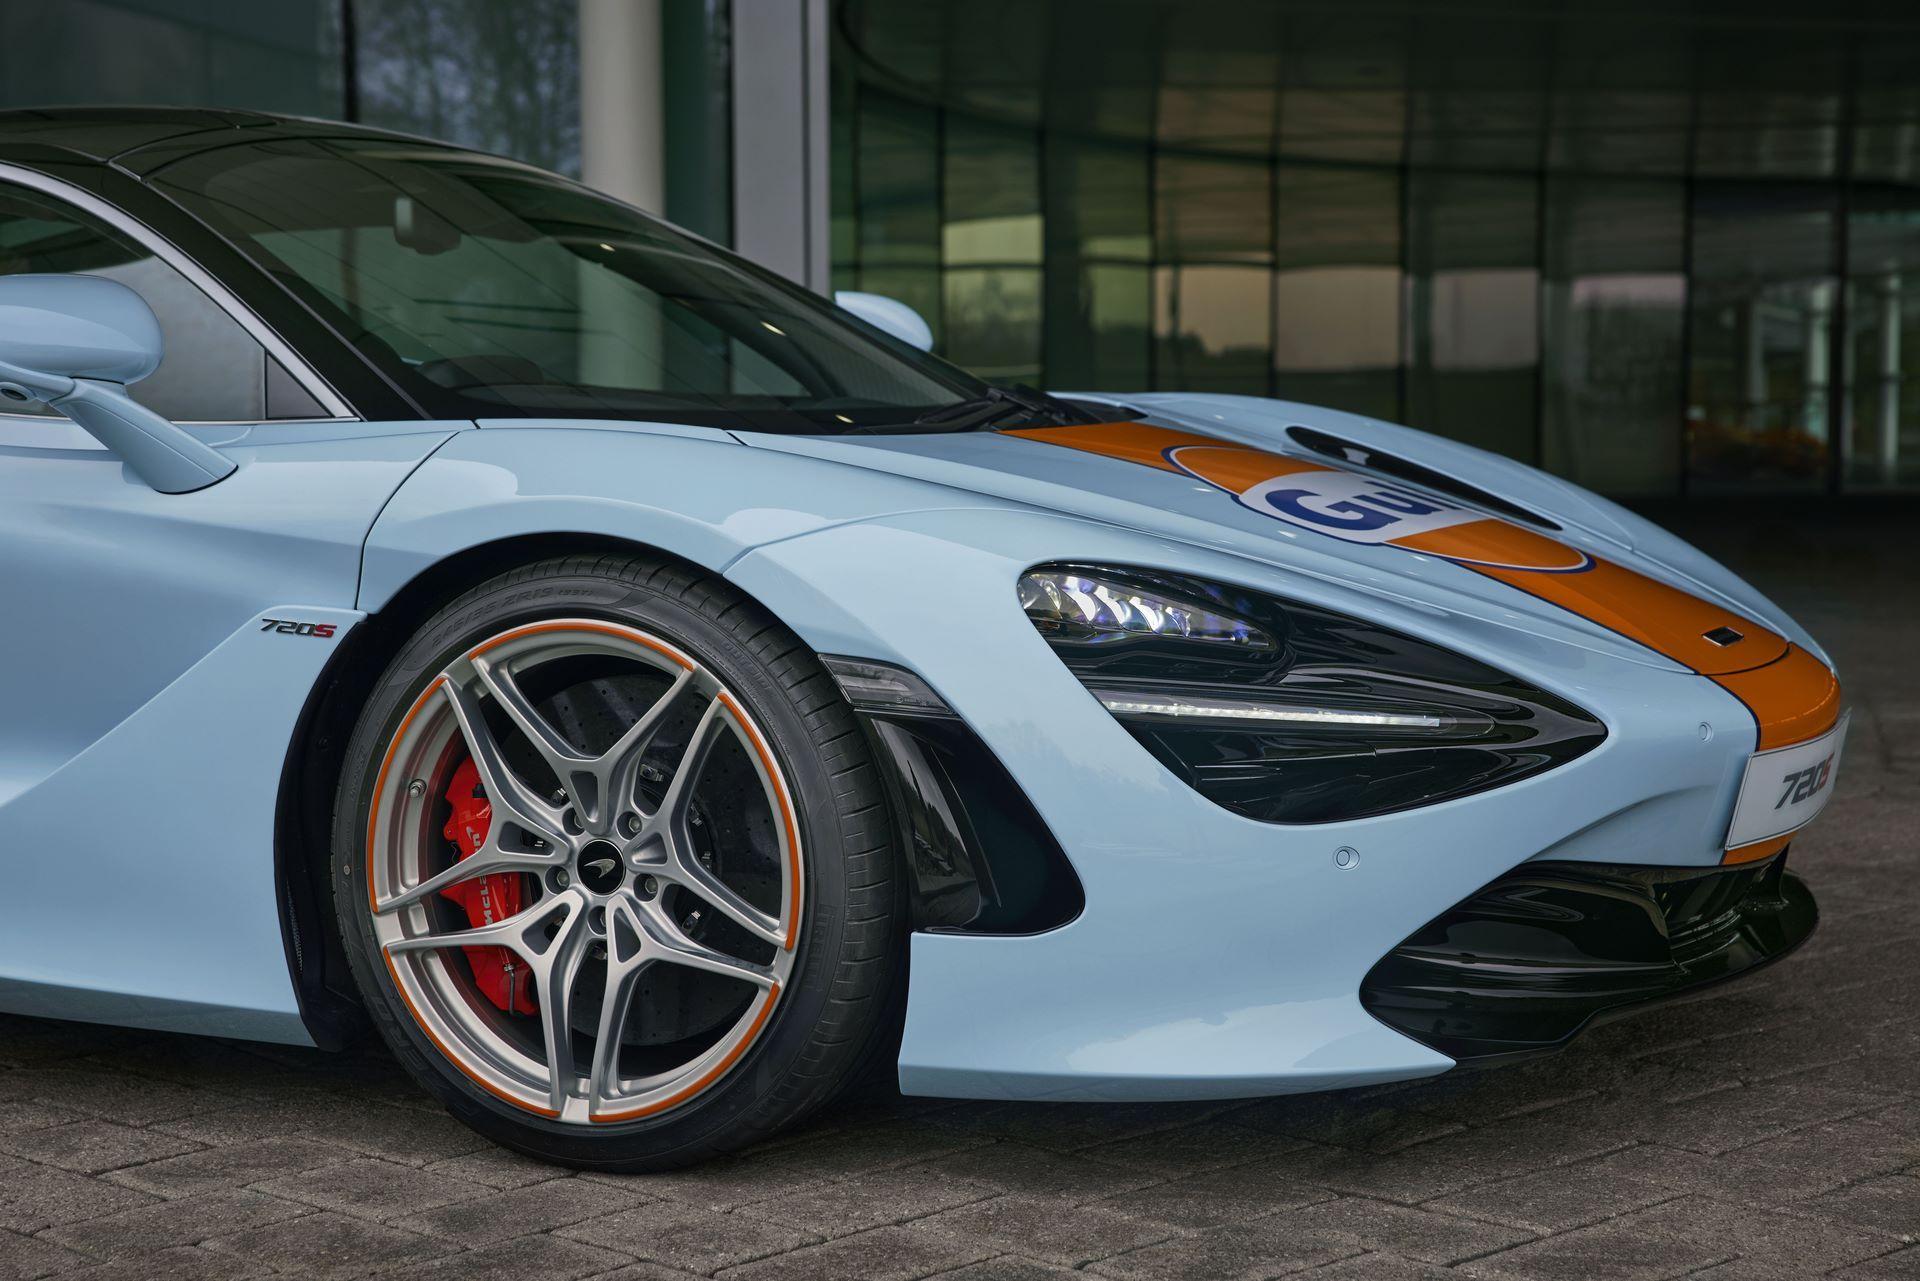 McLaren-720S-with-Gulf-livery-10